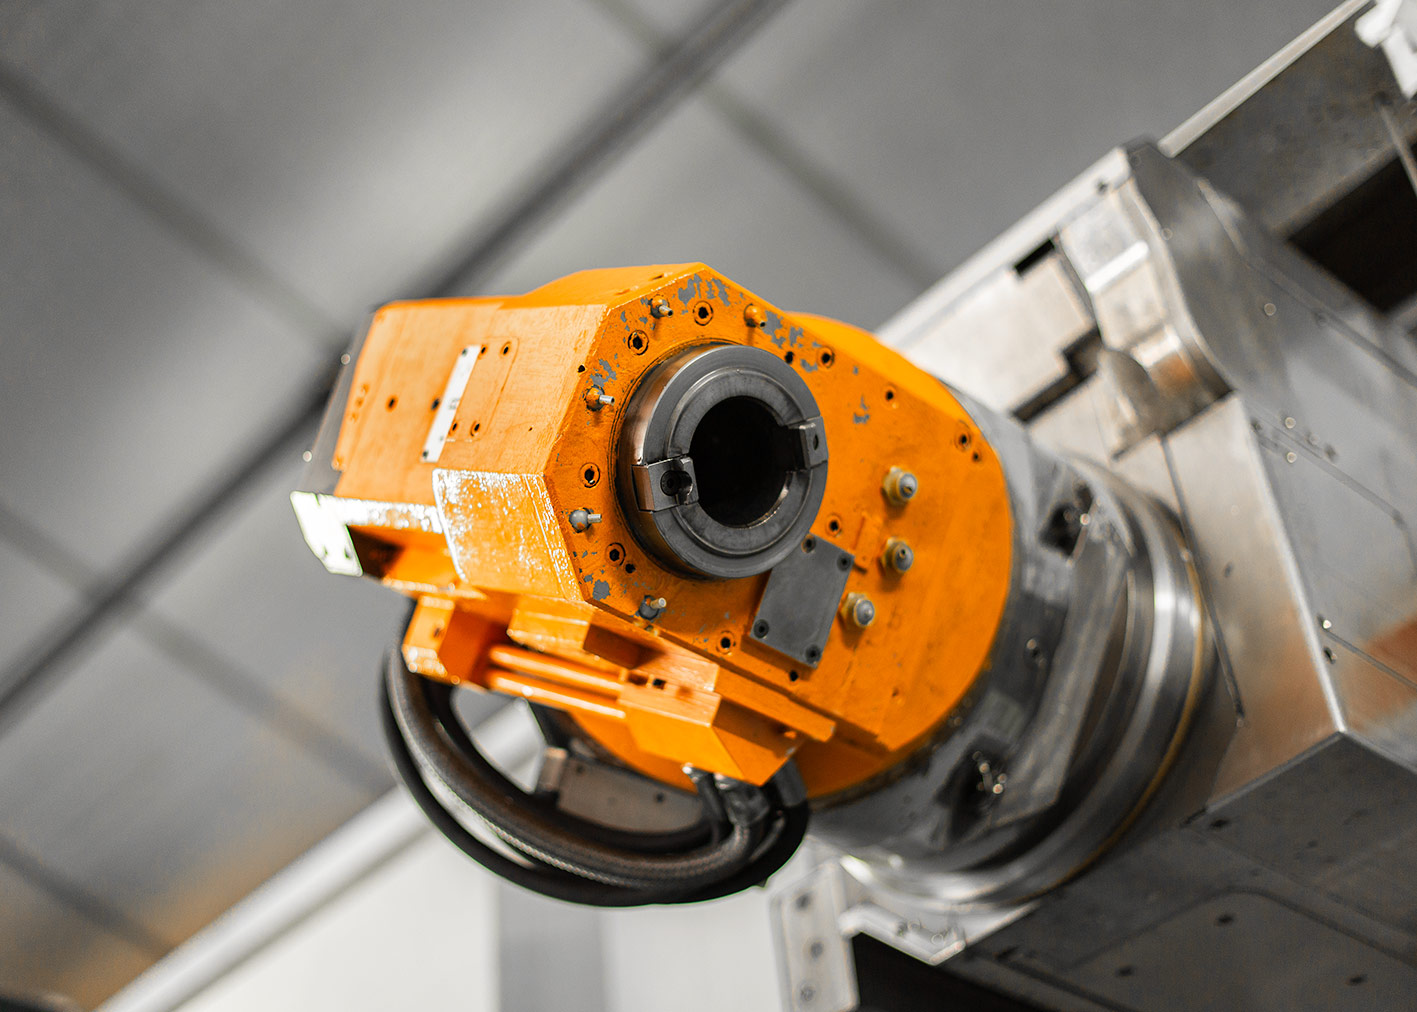 Reiden BFR24 fraisage atelier reco mecanique valais sierre salgesch